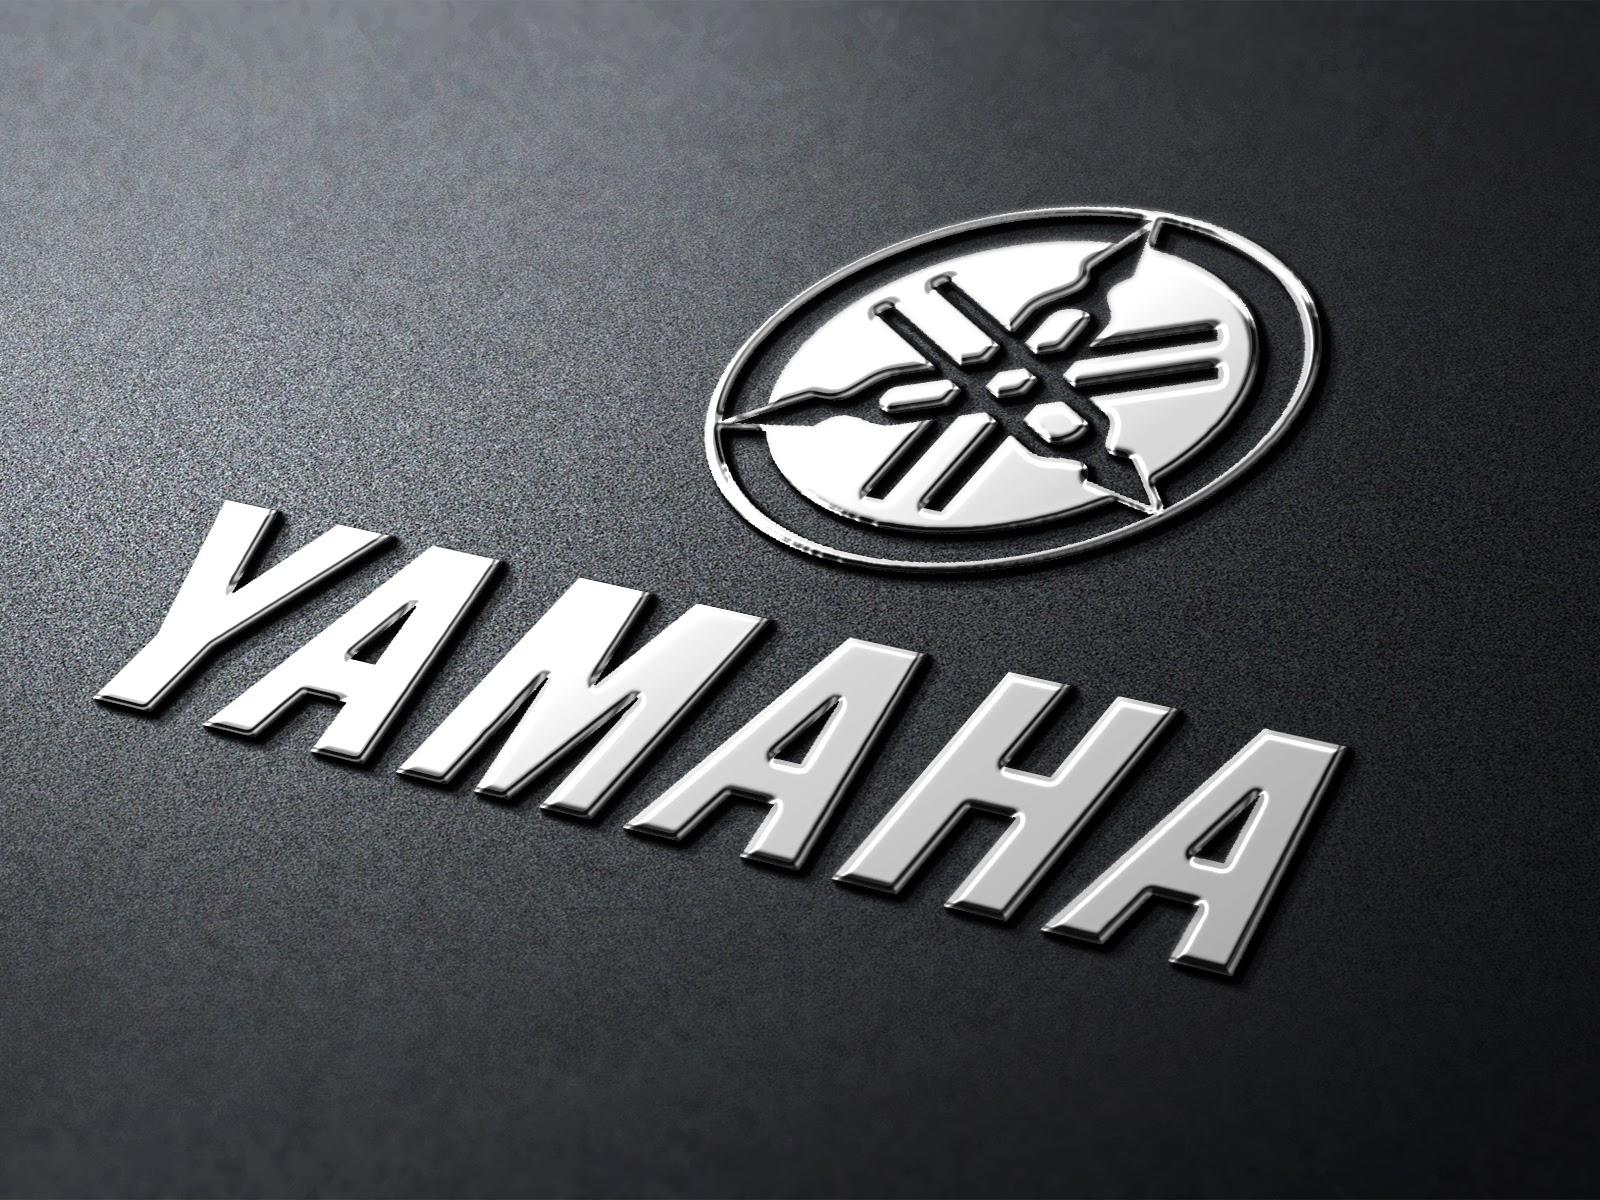 yamaha motor company [ 1600 x 1200 Pixel ]